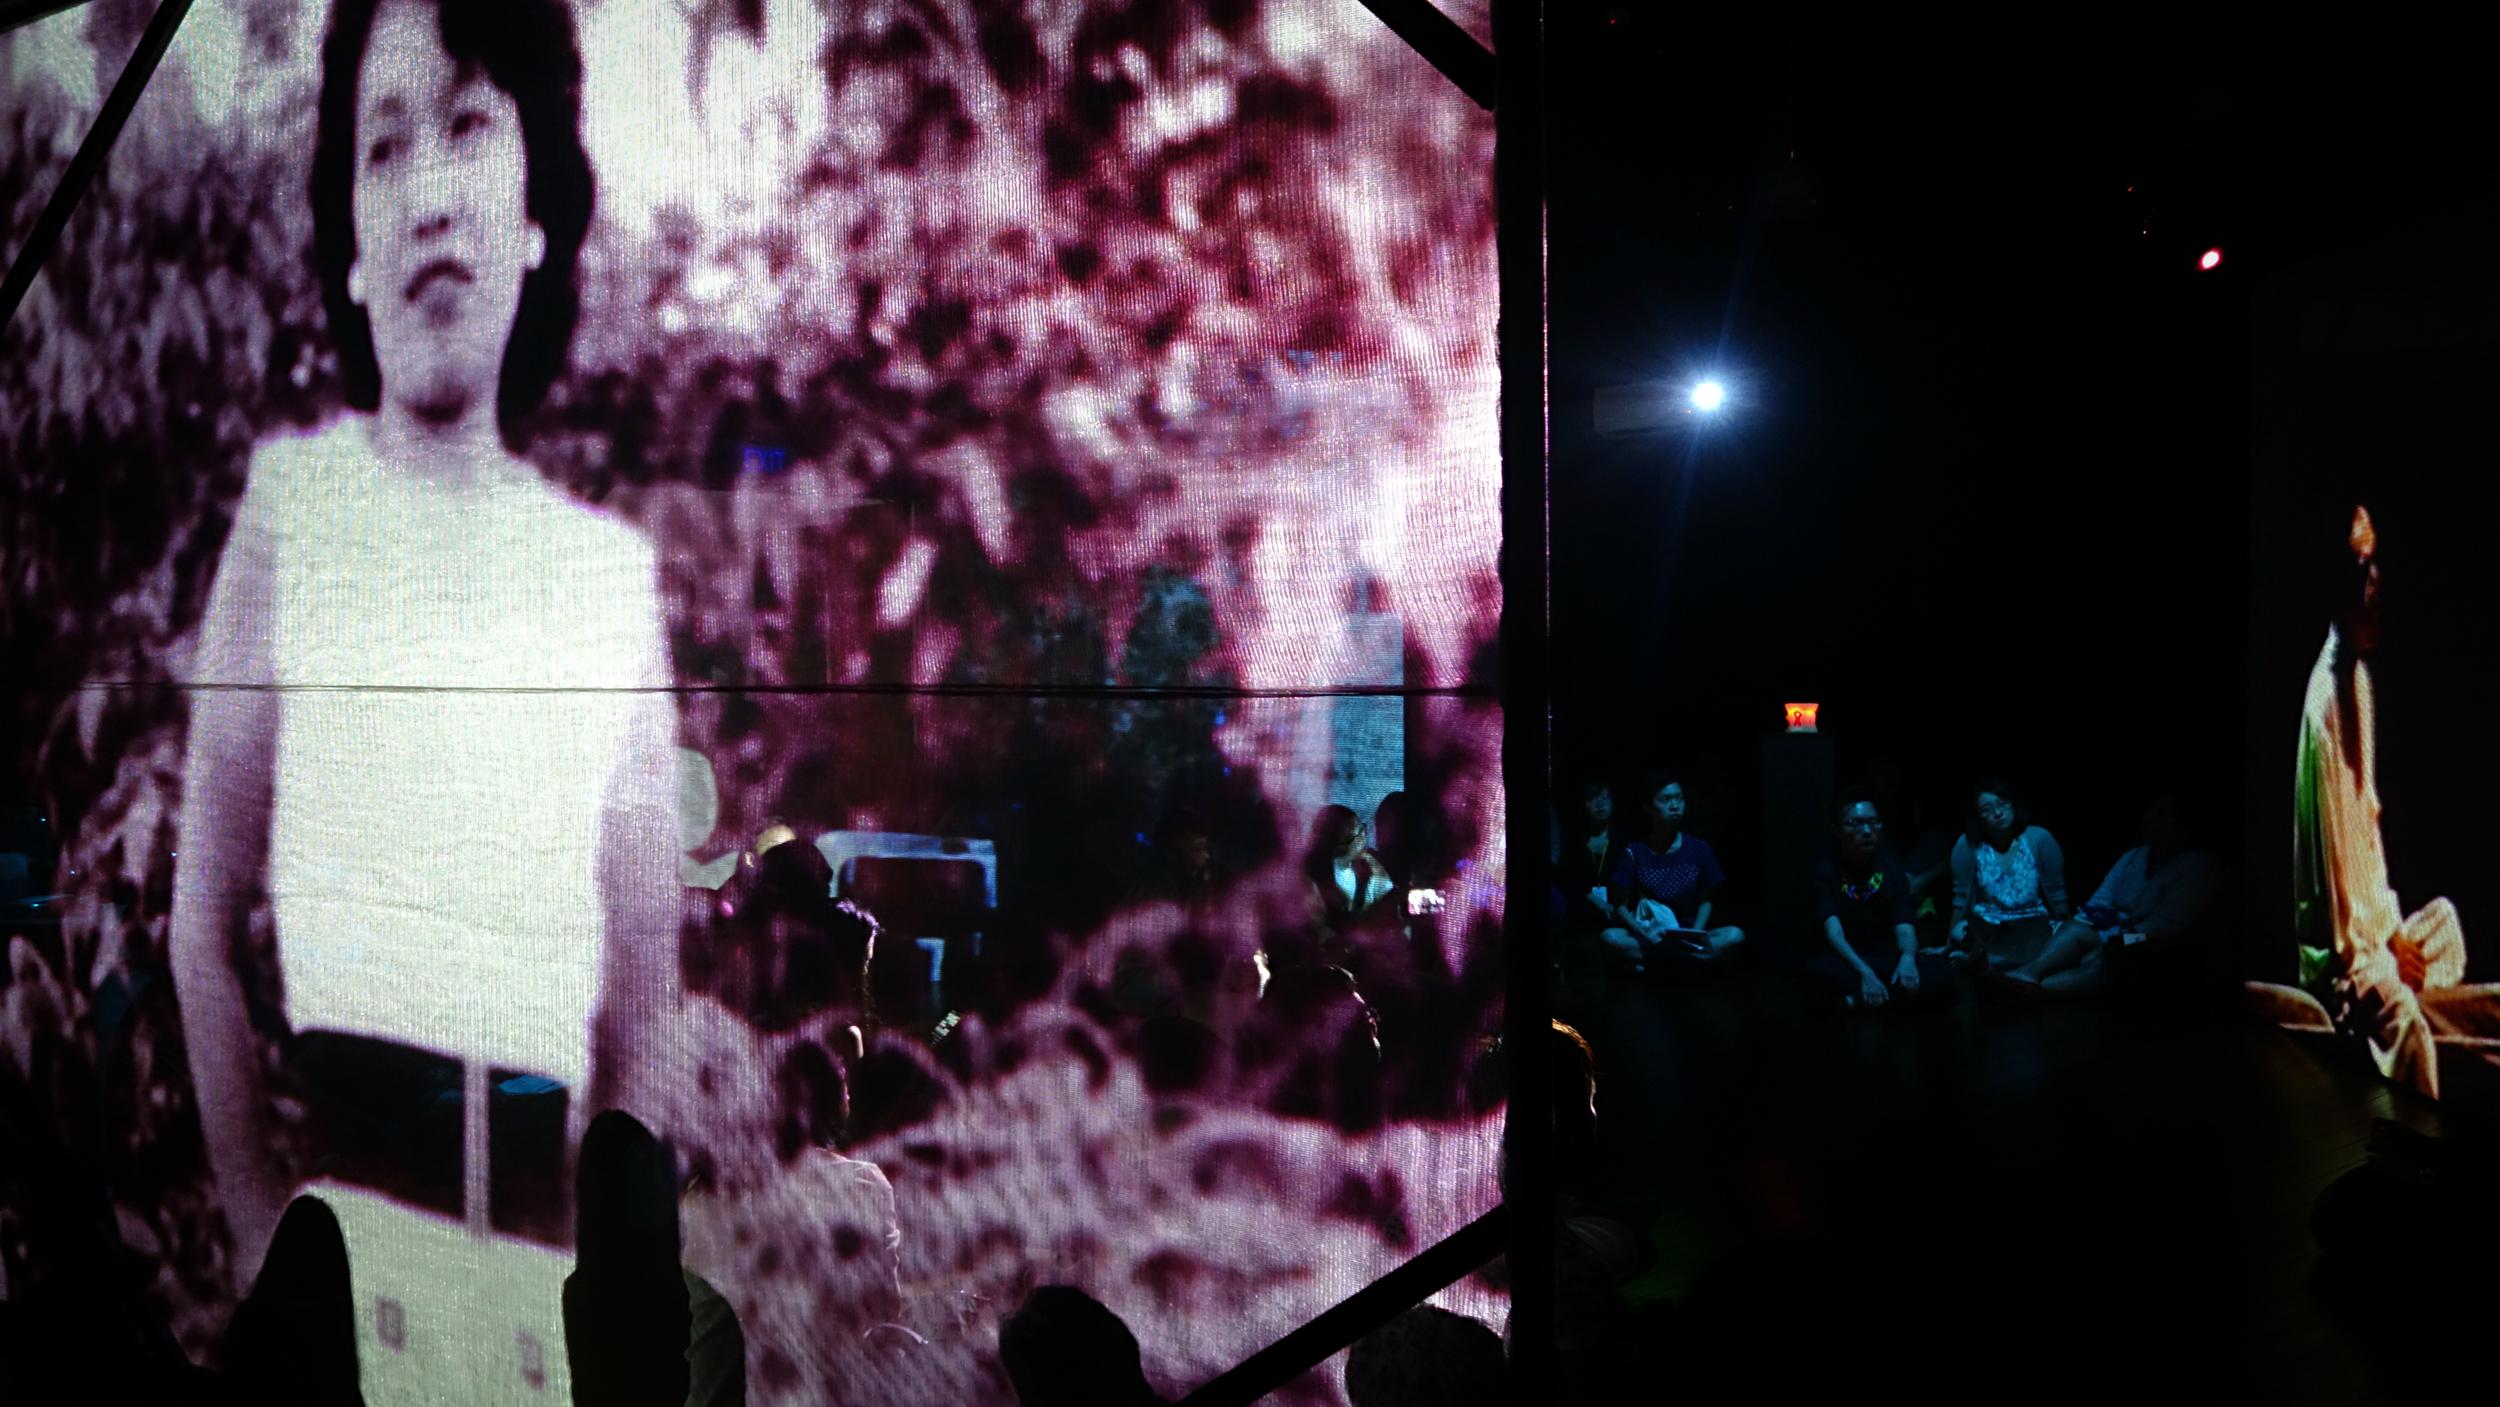 Performance Documentation: Roger Winder